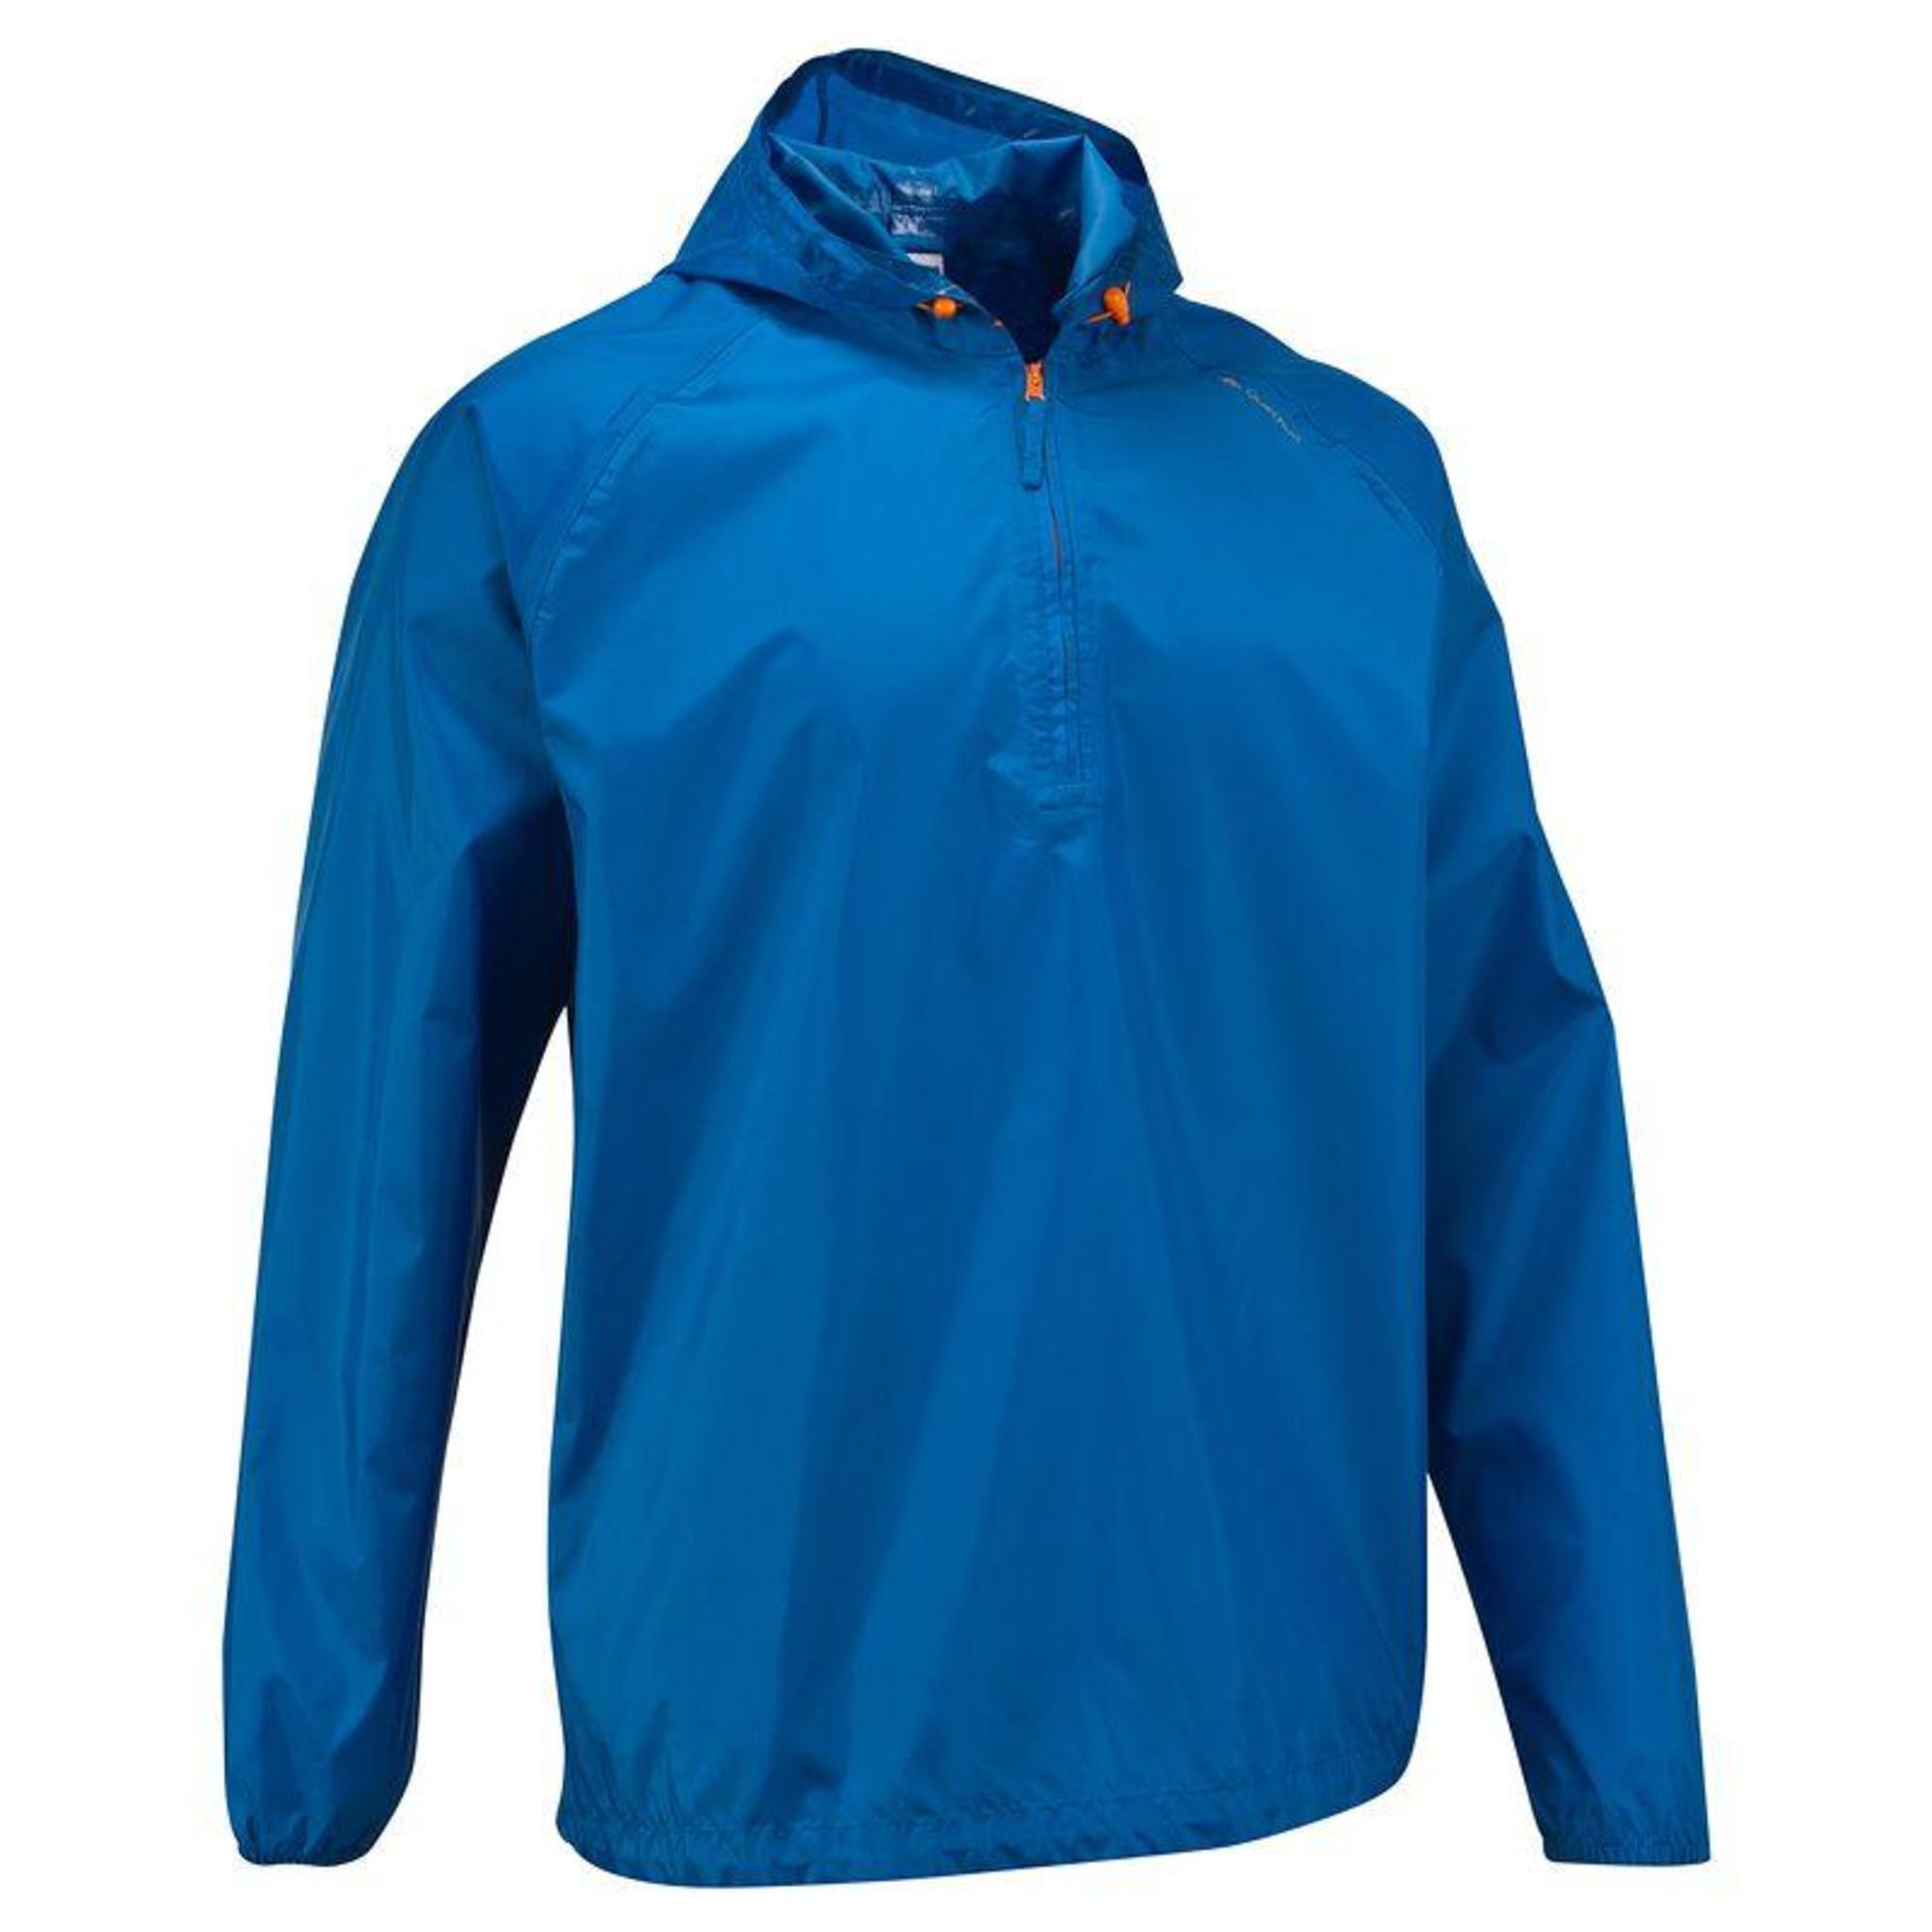 Rain-Cut Men's Hiking Waterproof Rain Jacket - Blue   Quechua